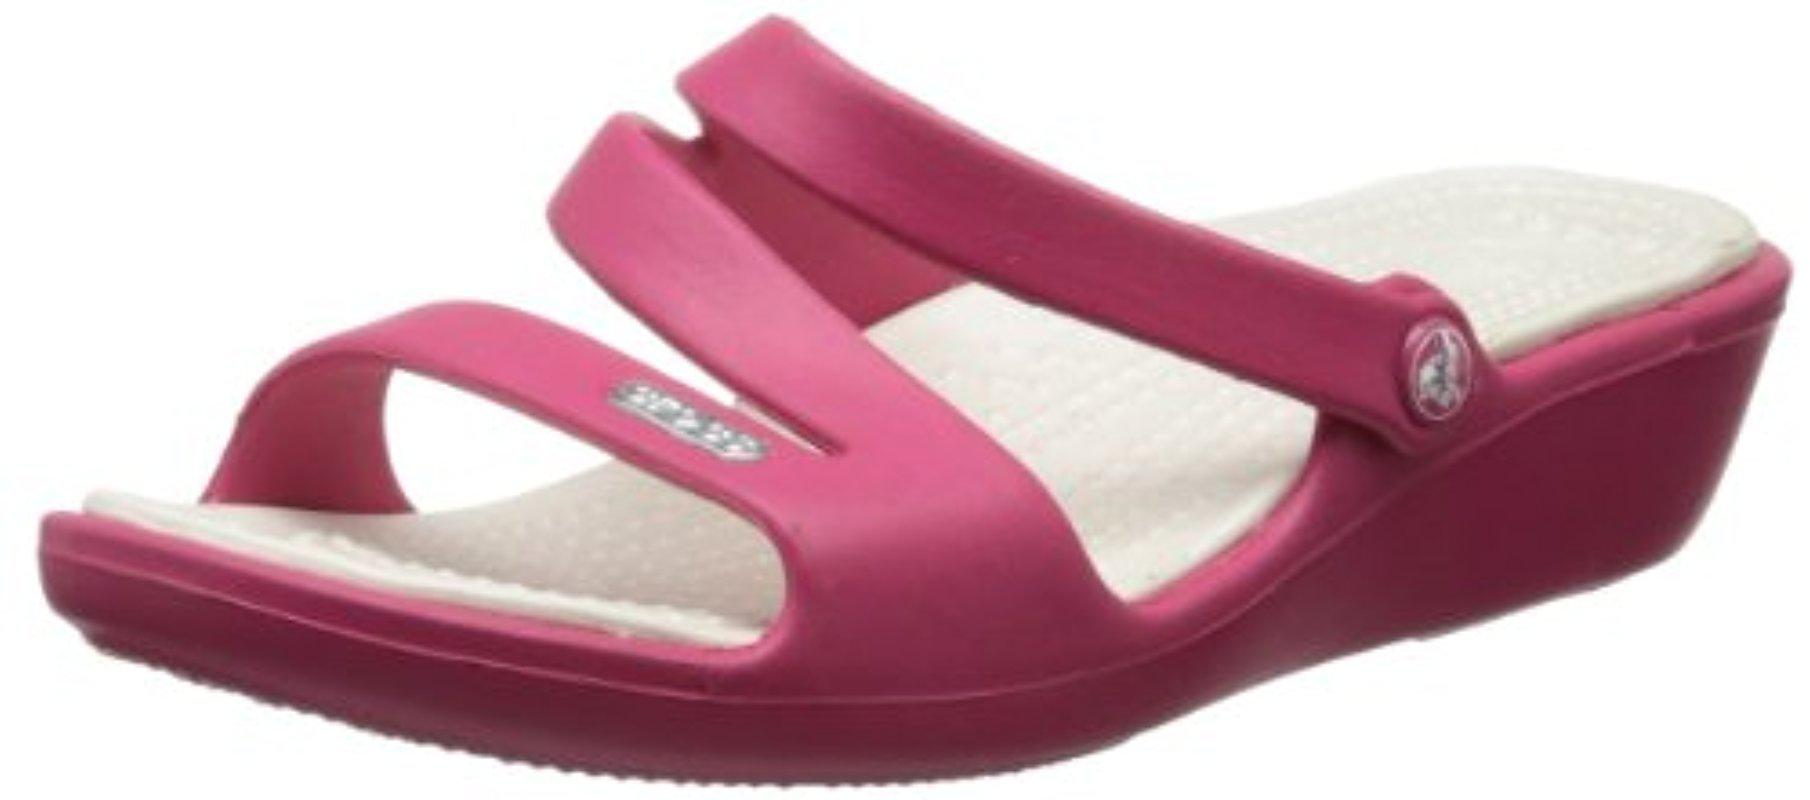 975911fc59ee1 Lyst - Crocs™ Patricia Sandal in Purple